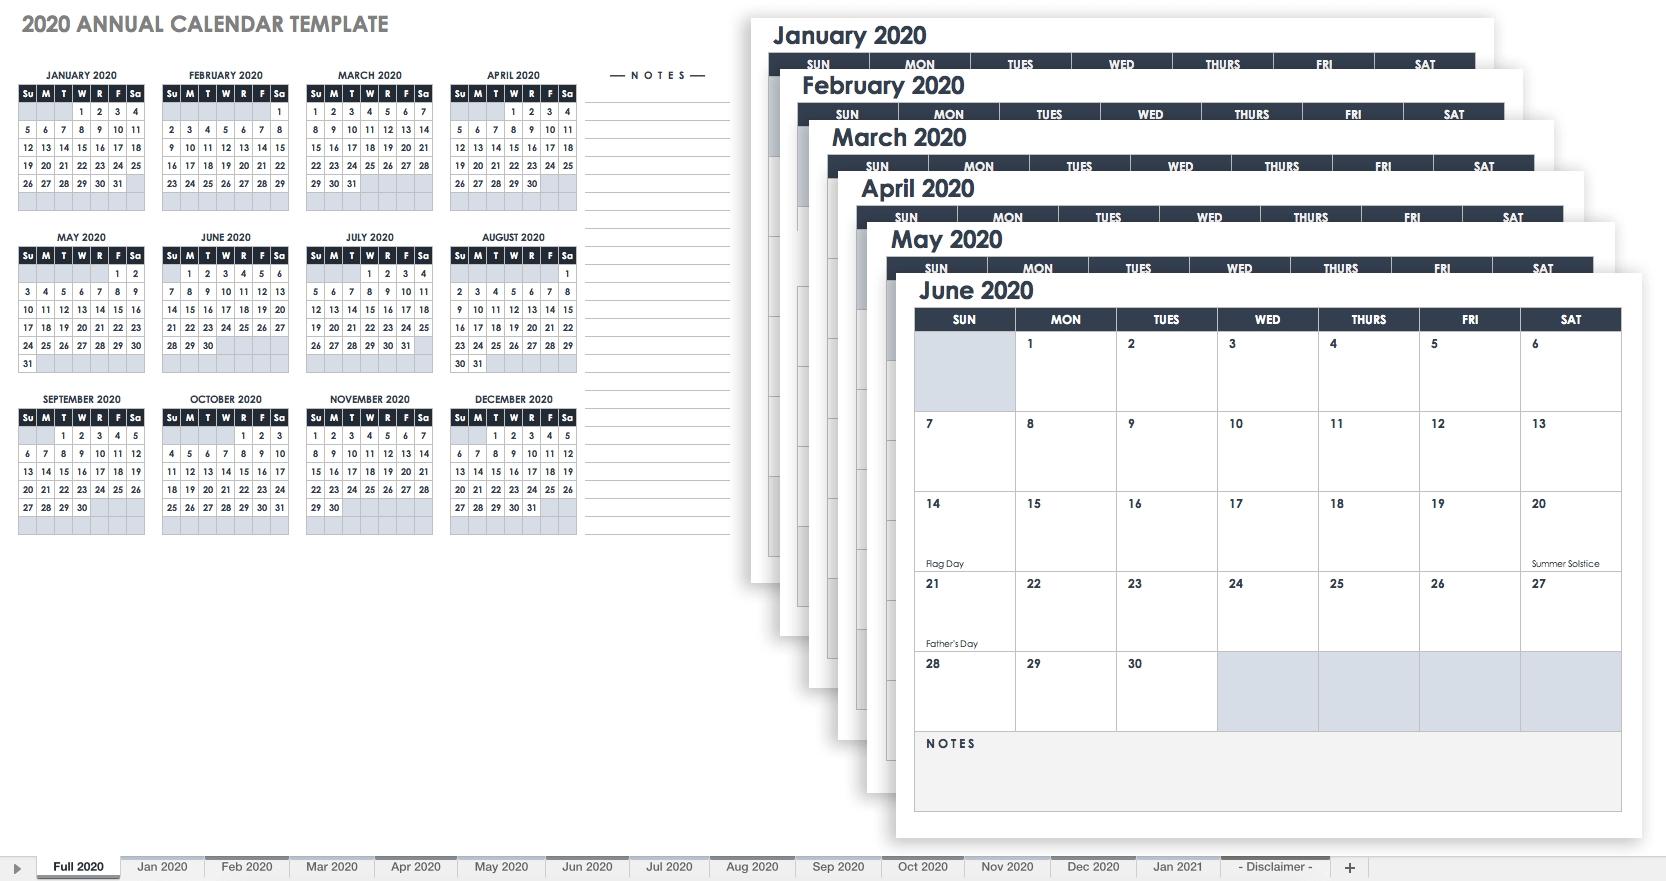 Free Blank Calendar Templates - Smartsheet in 7 Day Calendar Template Fillable